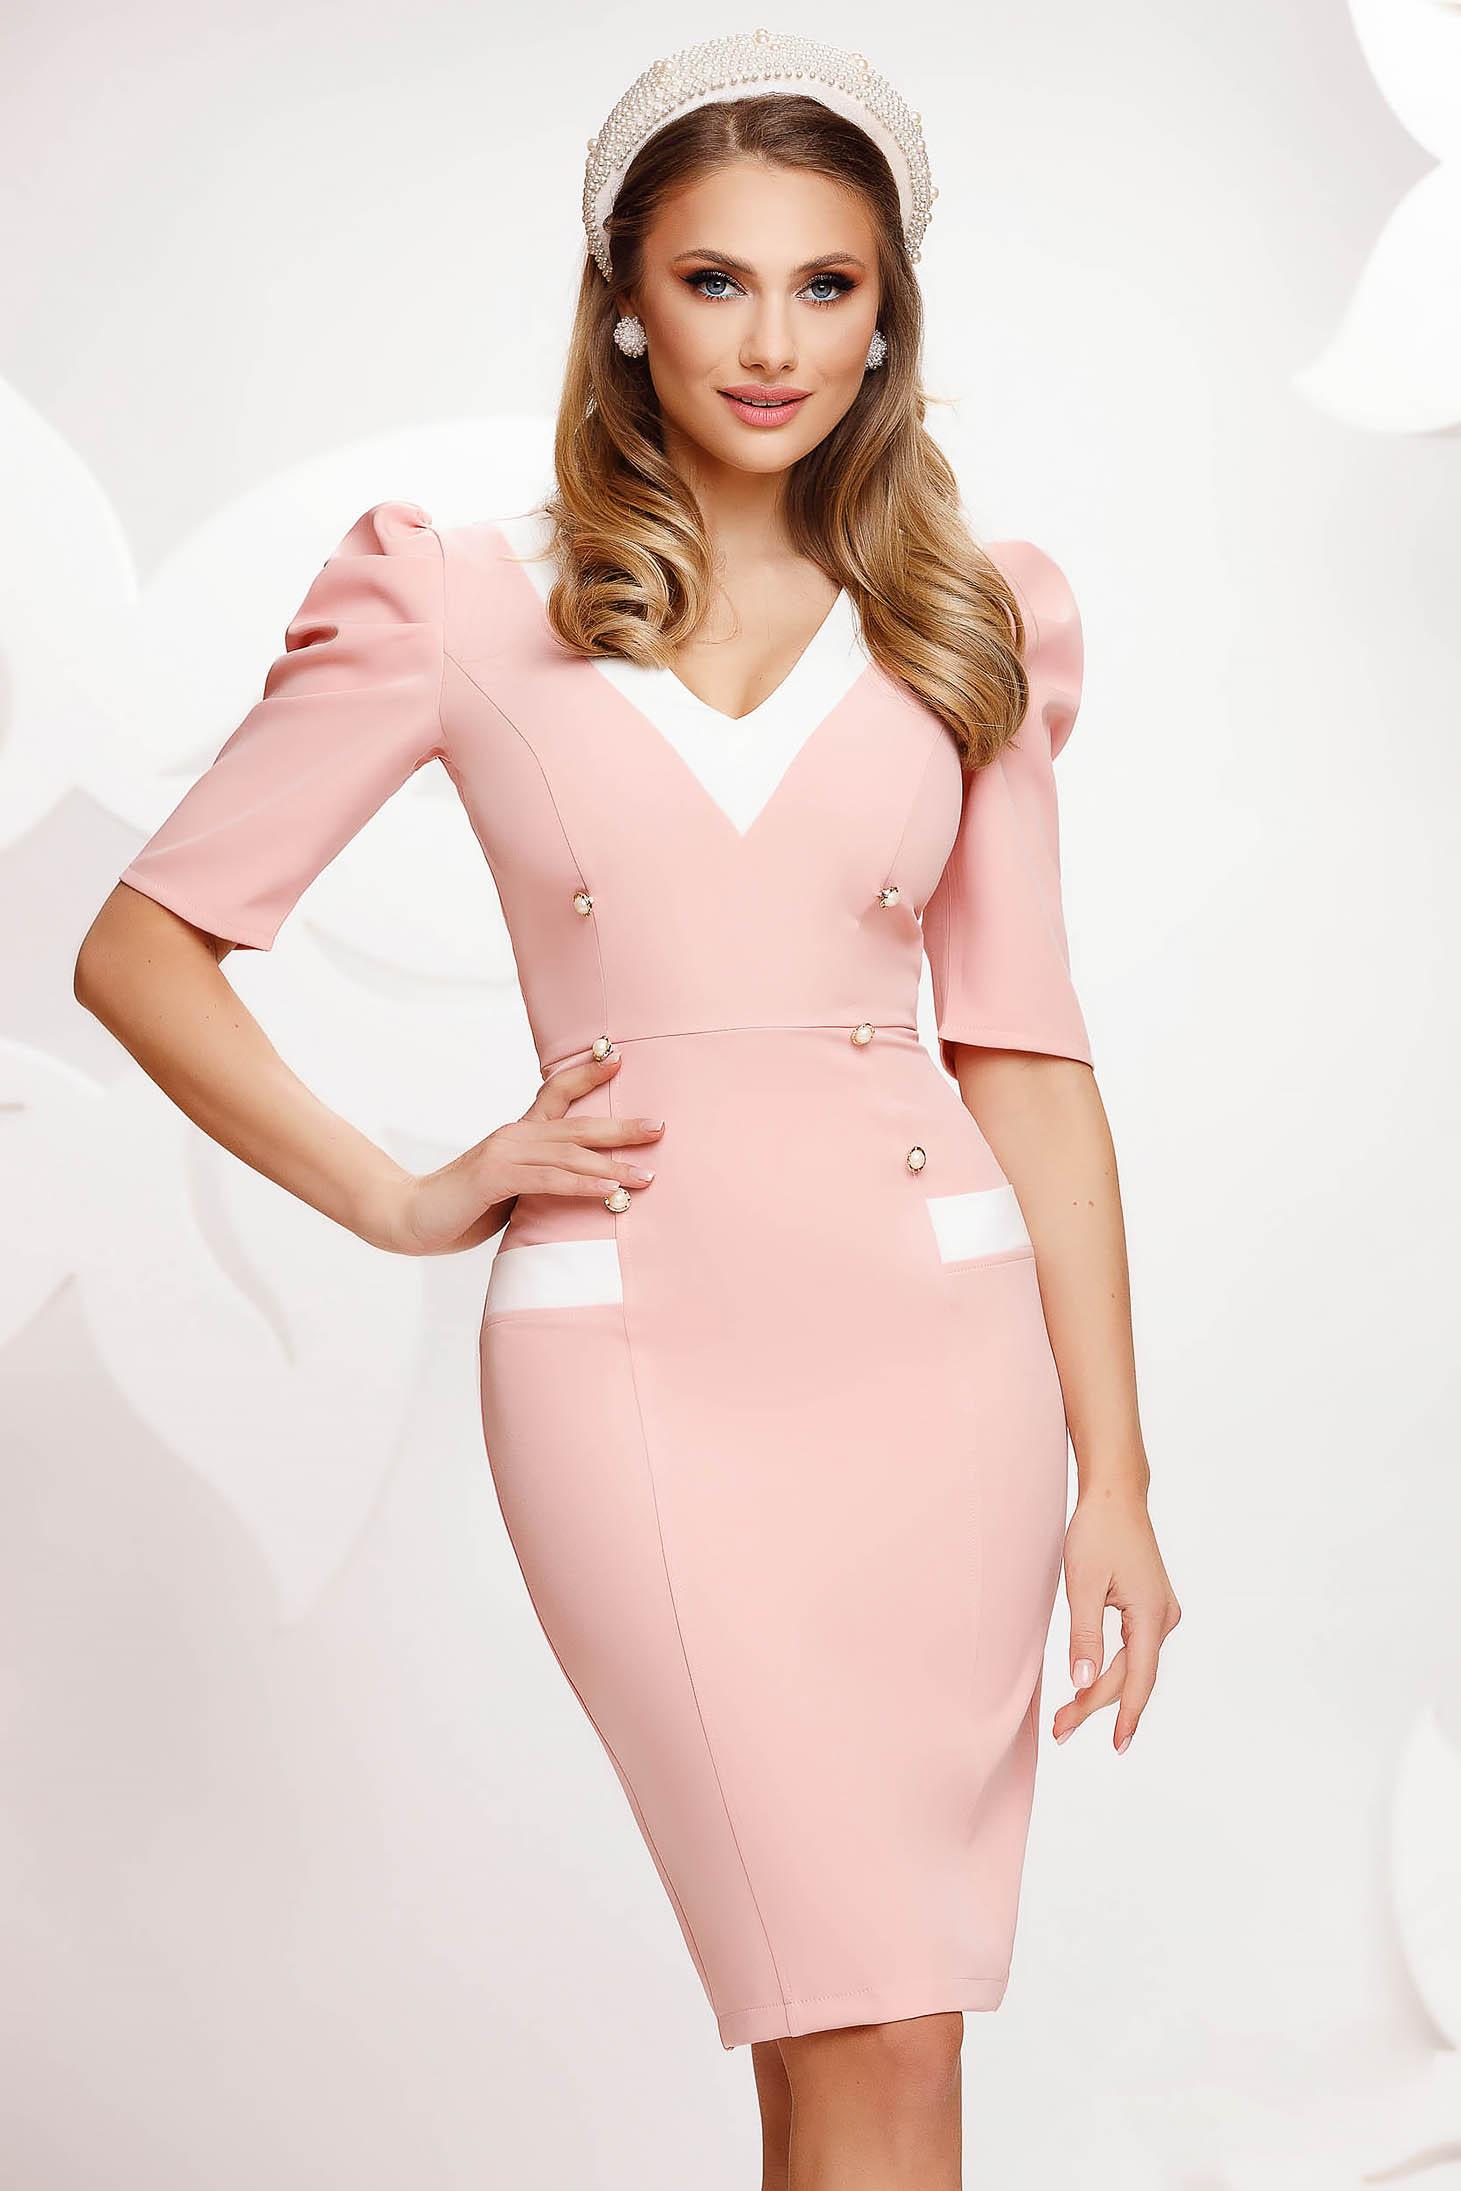 Pink dress office short cut pencil high shoulders